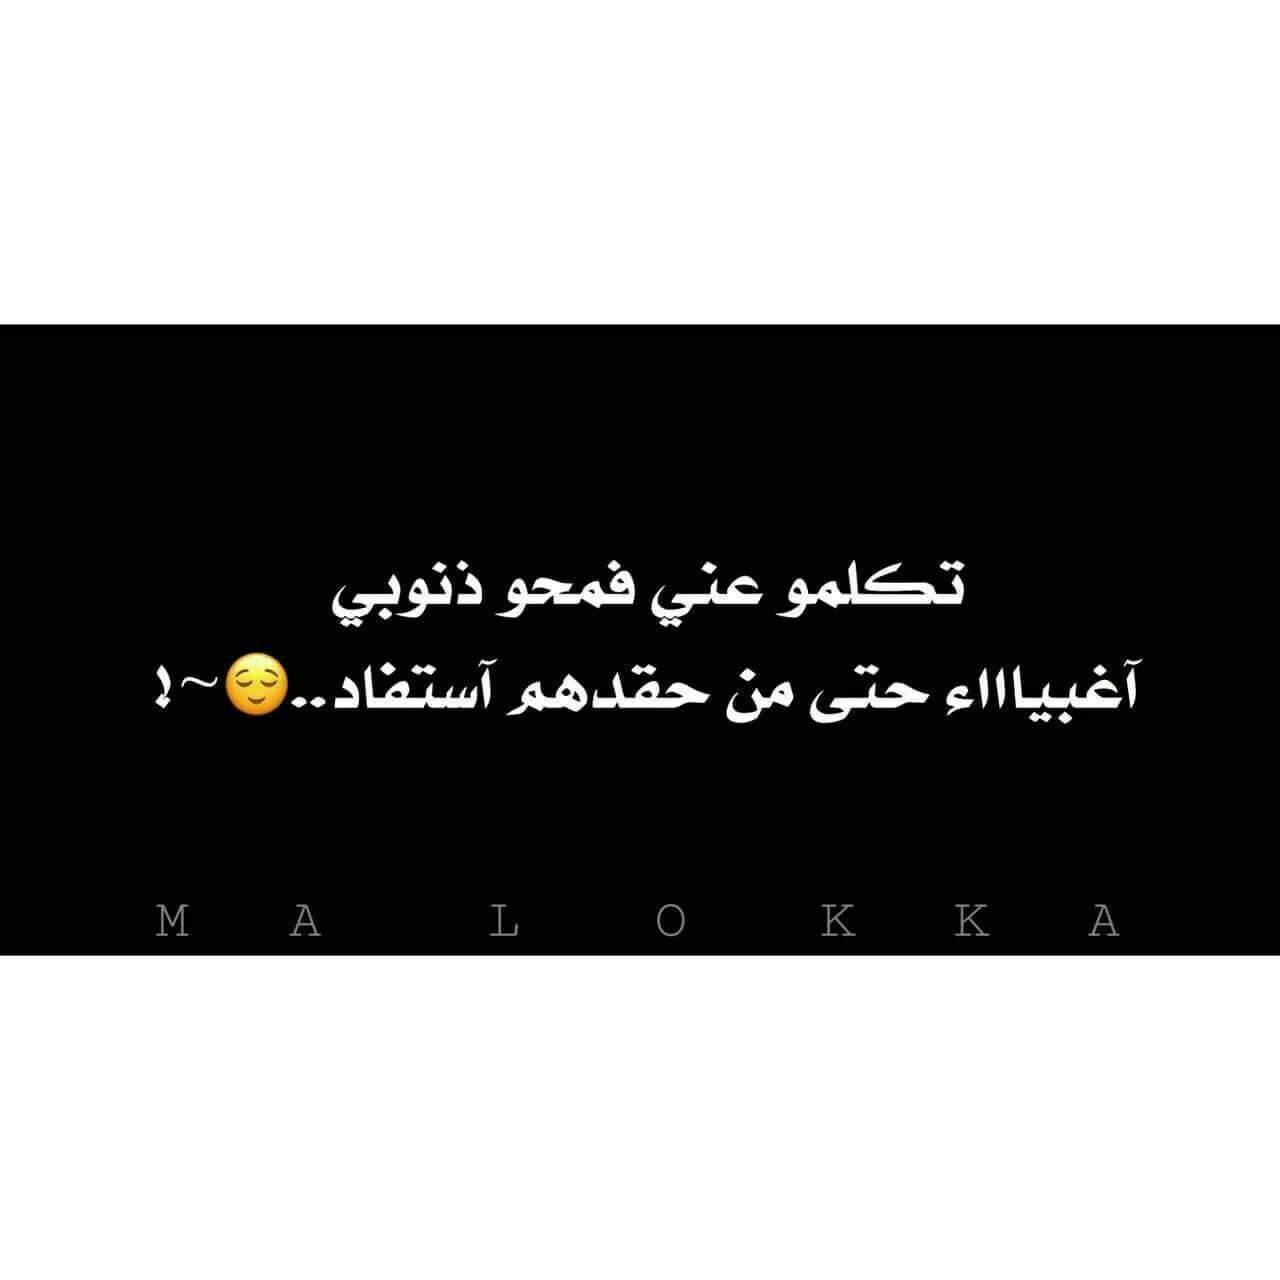 Pin By ֆء N ɑ W Ya ɑ ɑ On Words Words Arabic Calligraphy Calligraphy